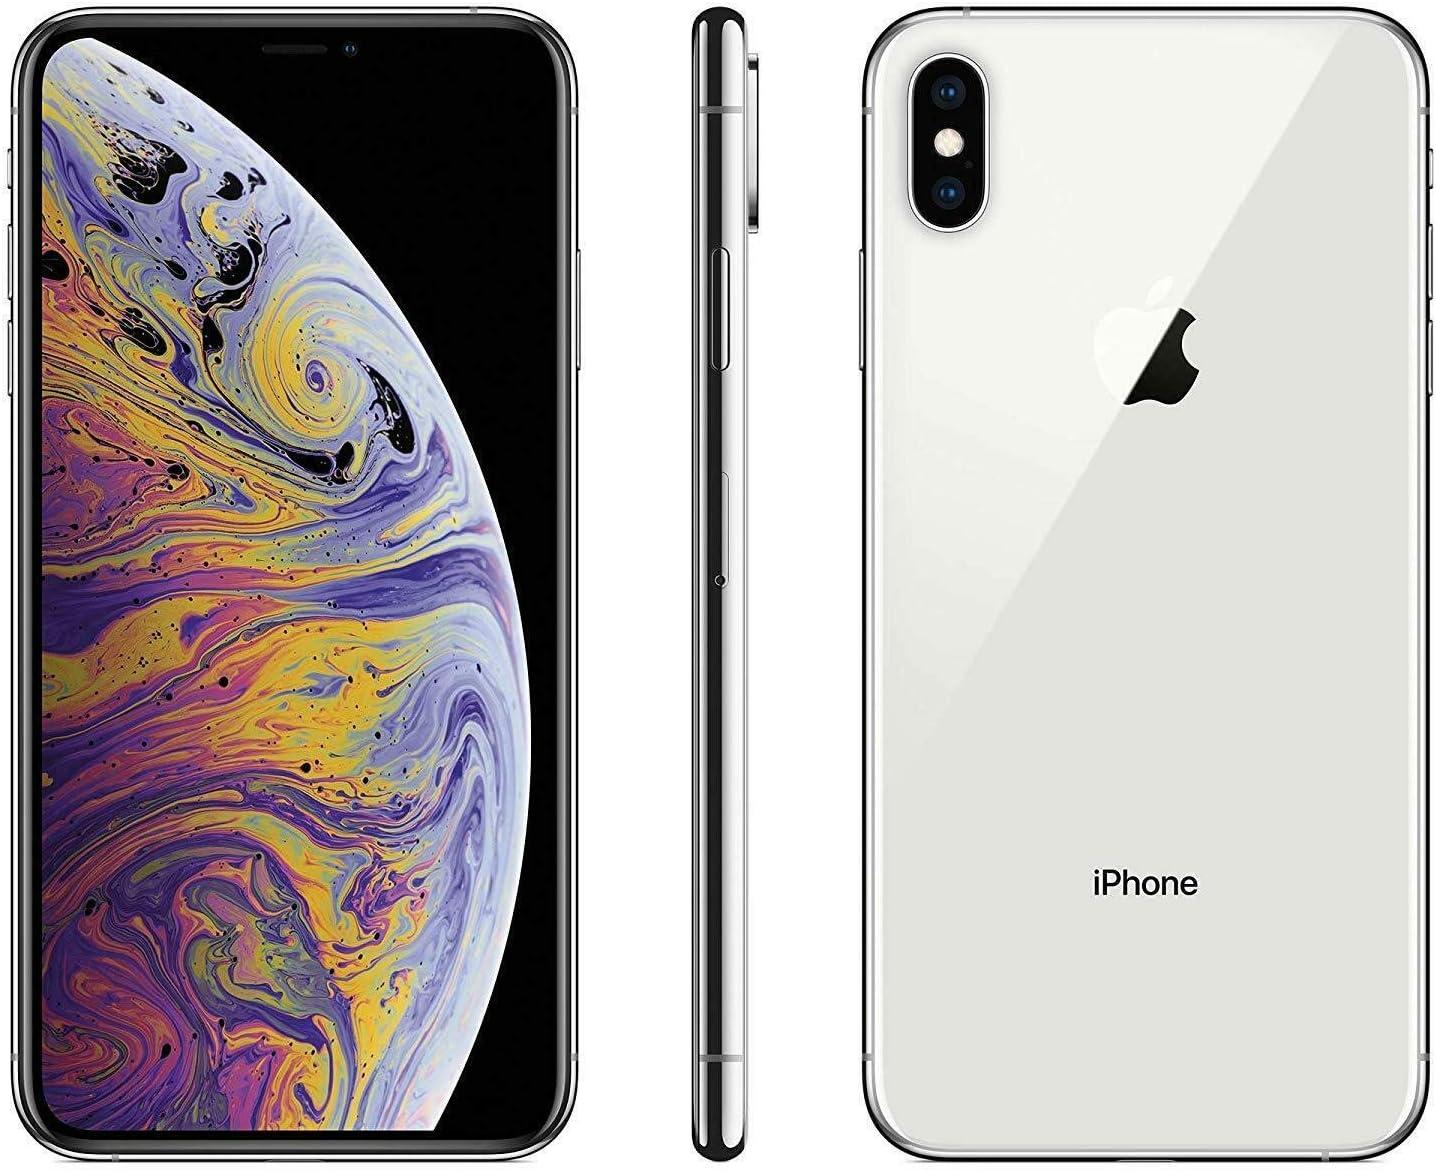 Apple iPhone XS Max, 256GB, Silver - Fully Unlocked (Renewed)